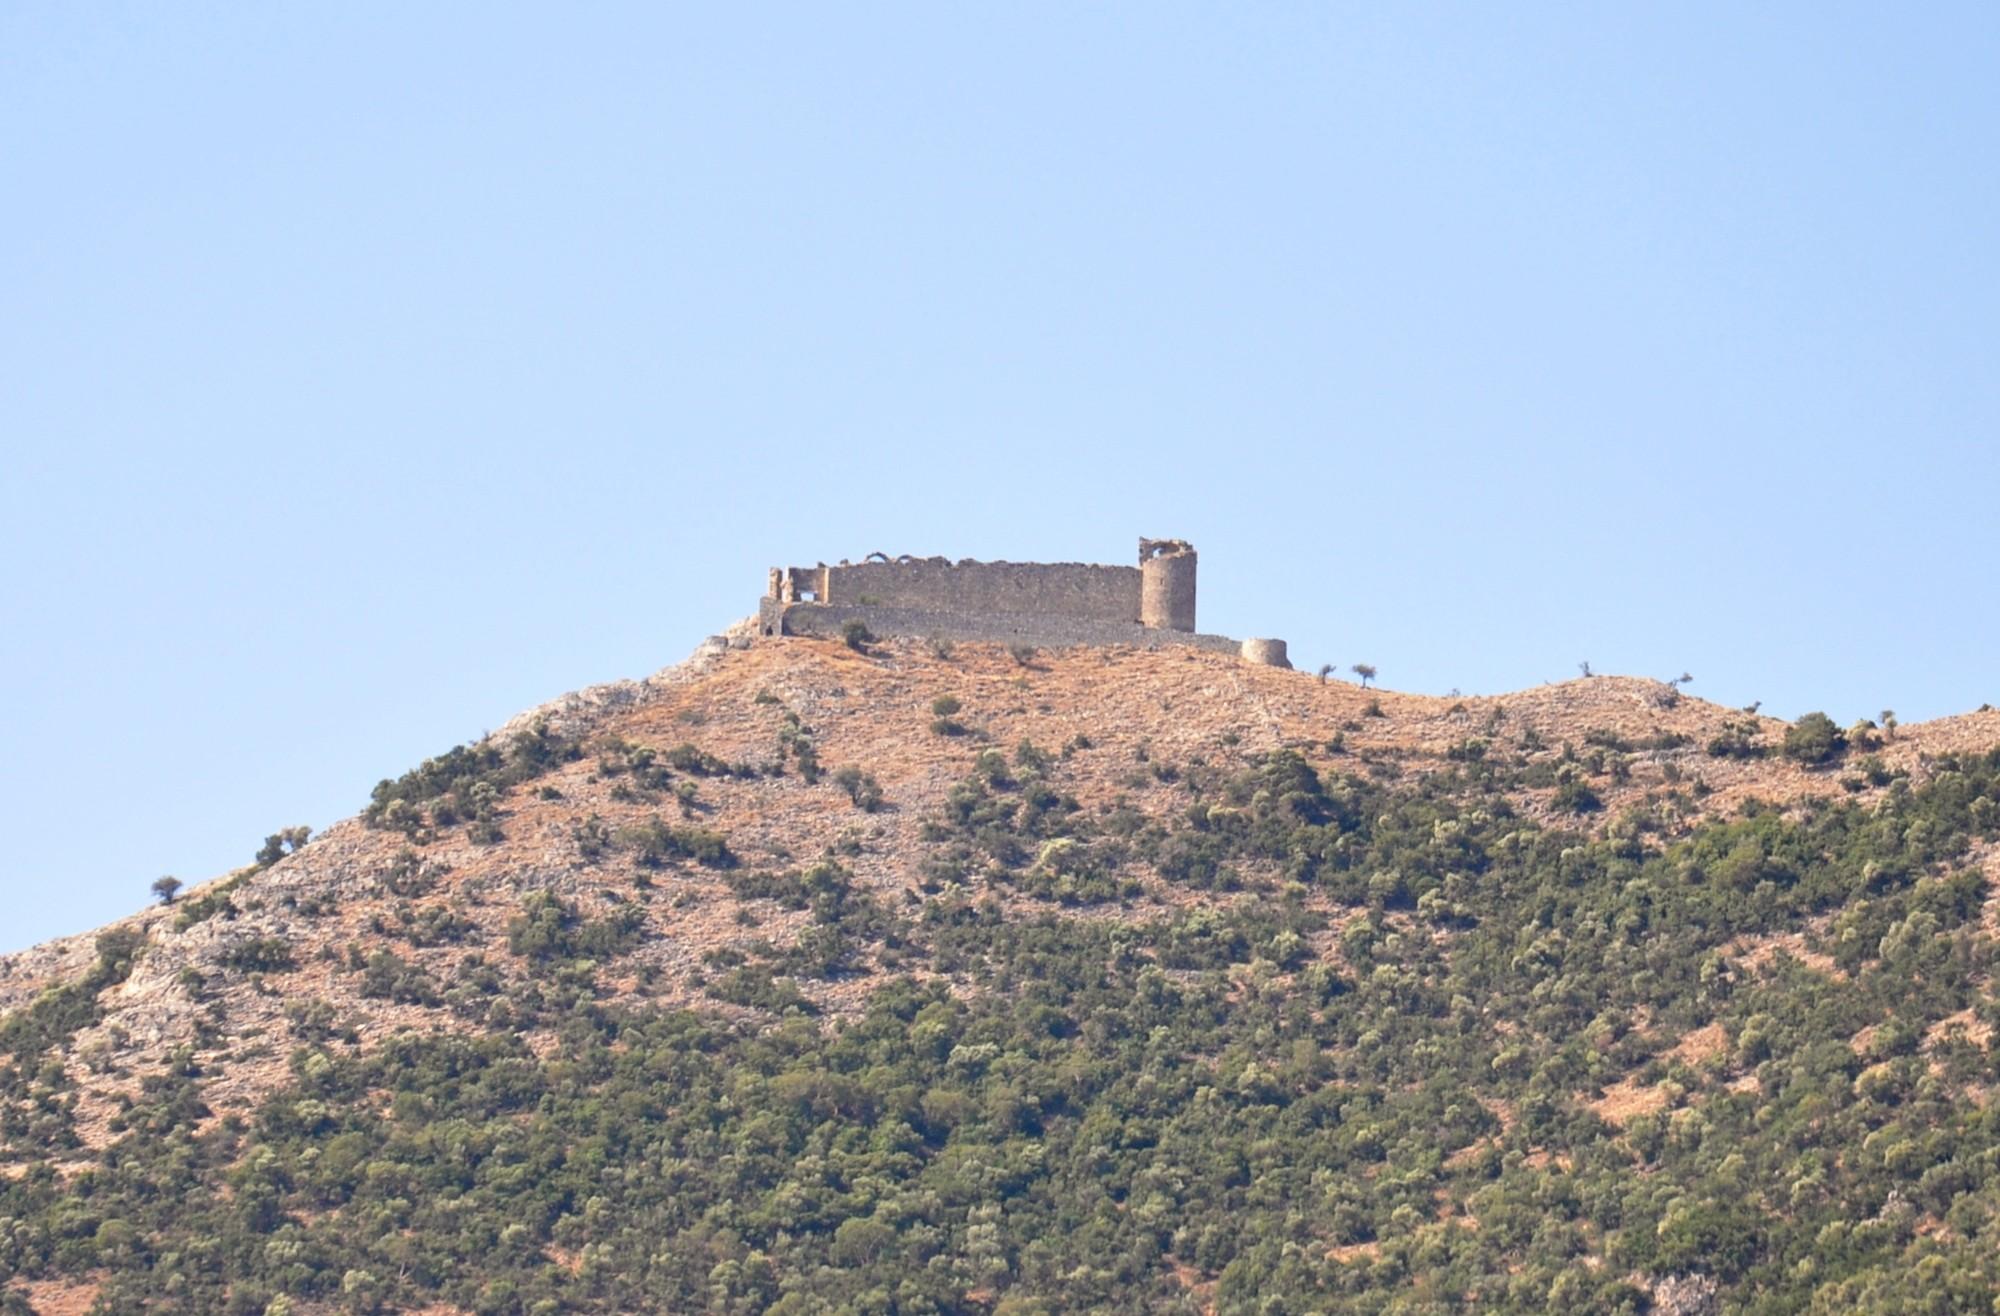 Kızılhisar Castle